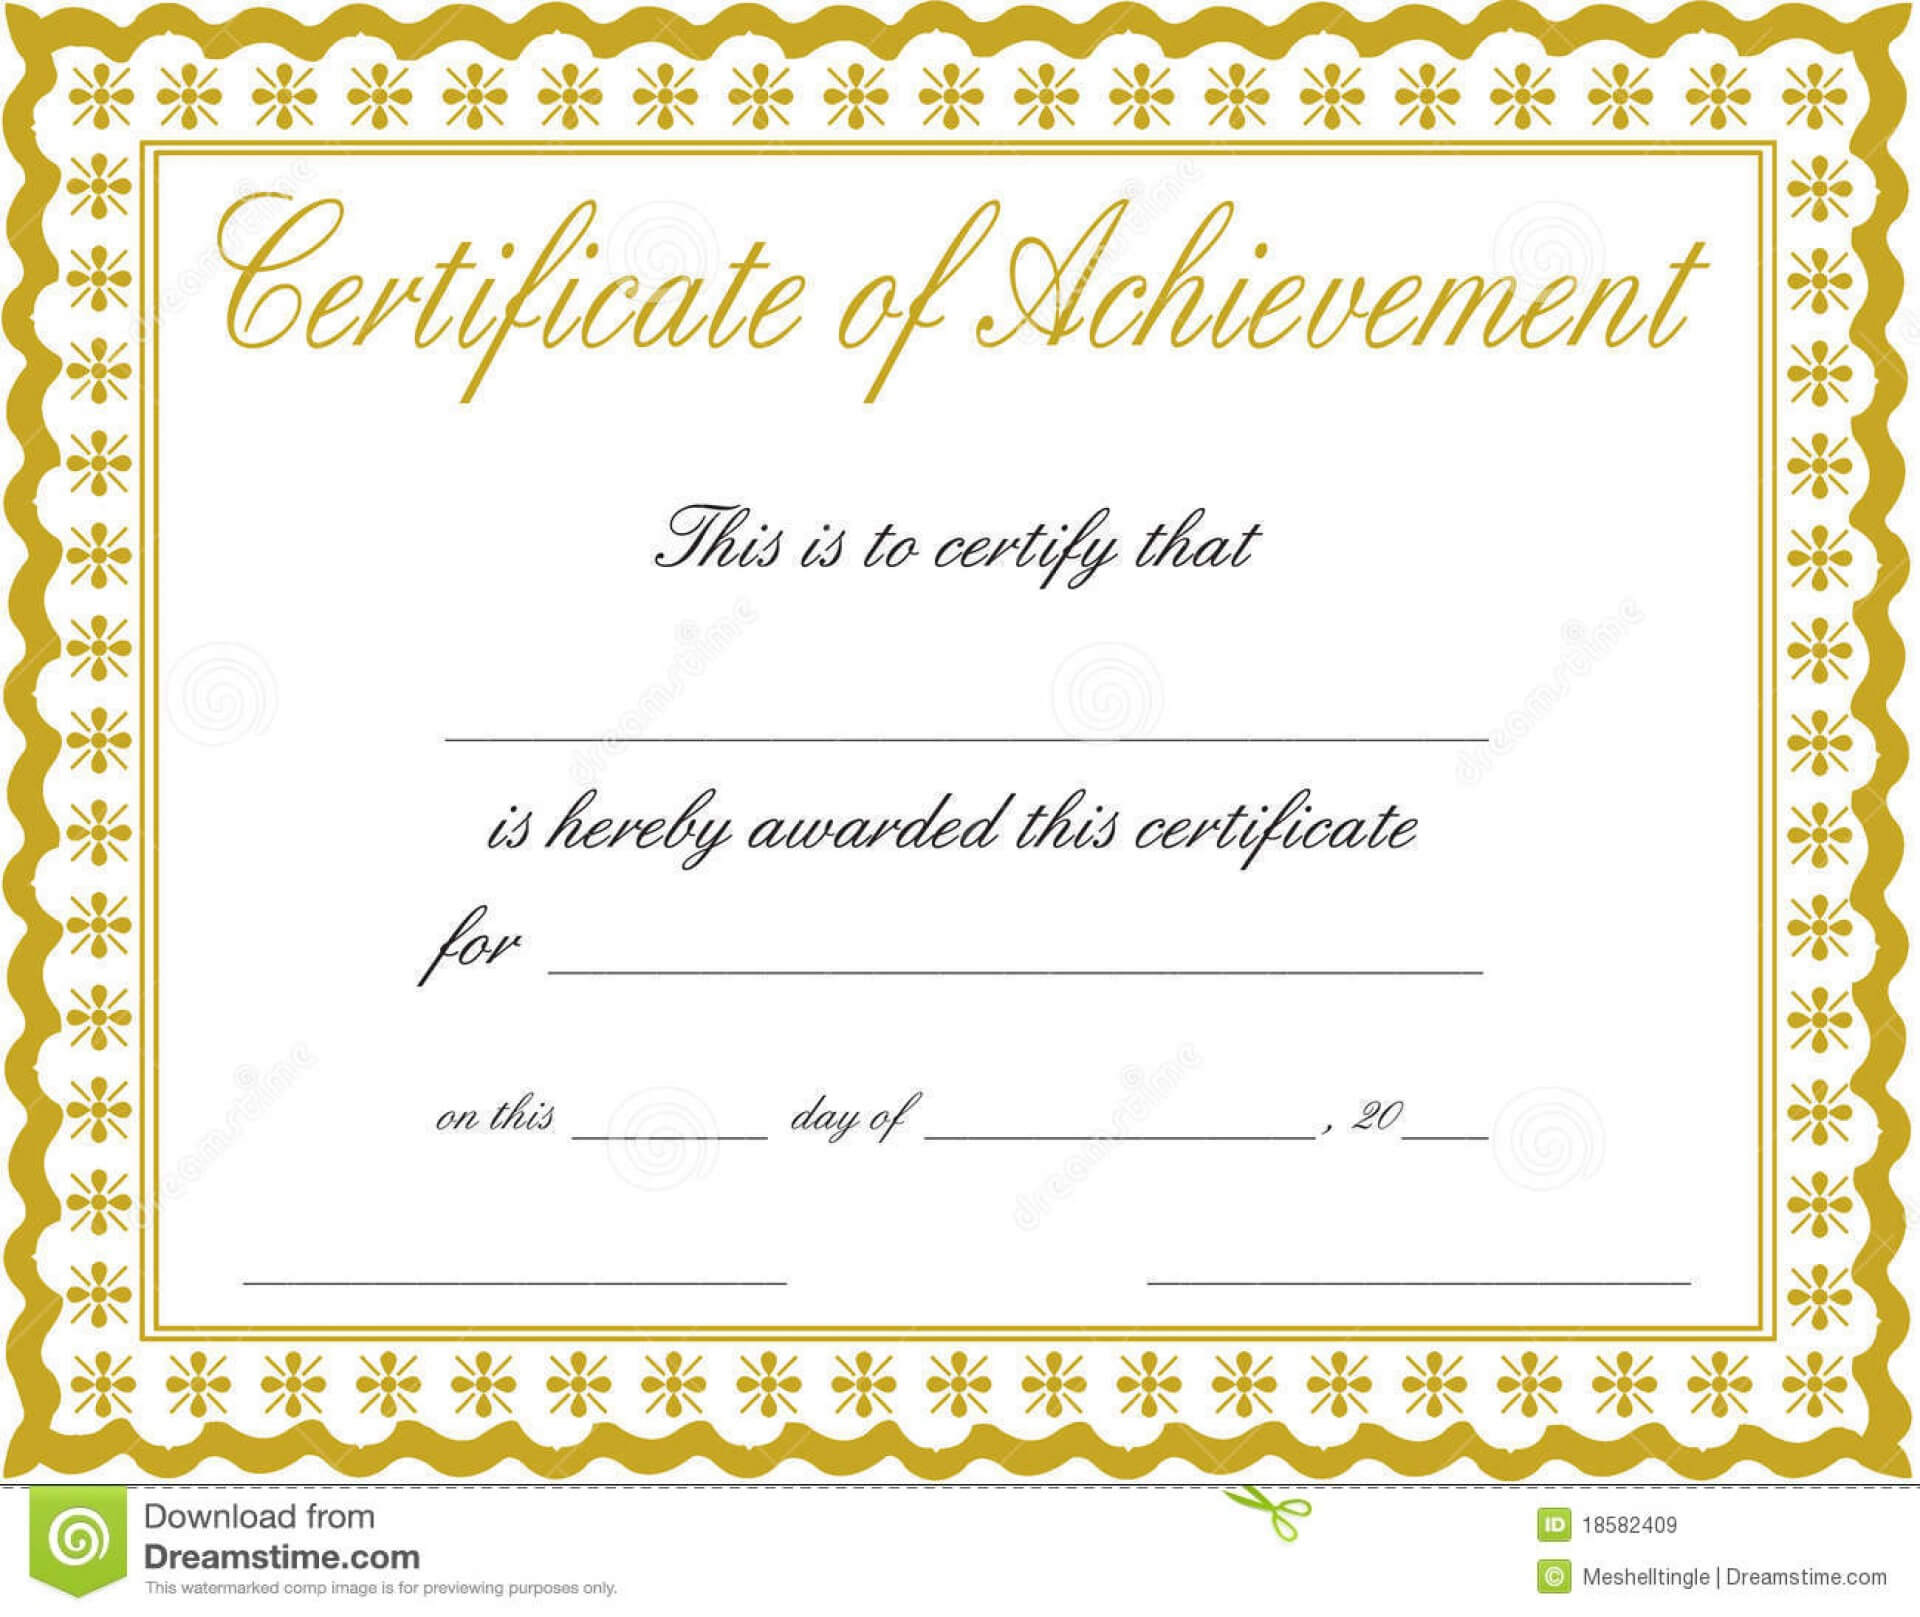 003 Certificate Of Achievement Template Free Ideas Throughout Blank Certificate Of Achievement Template